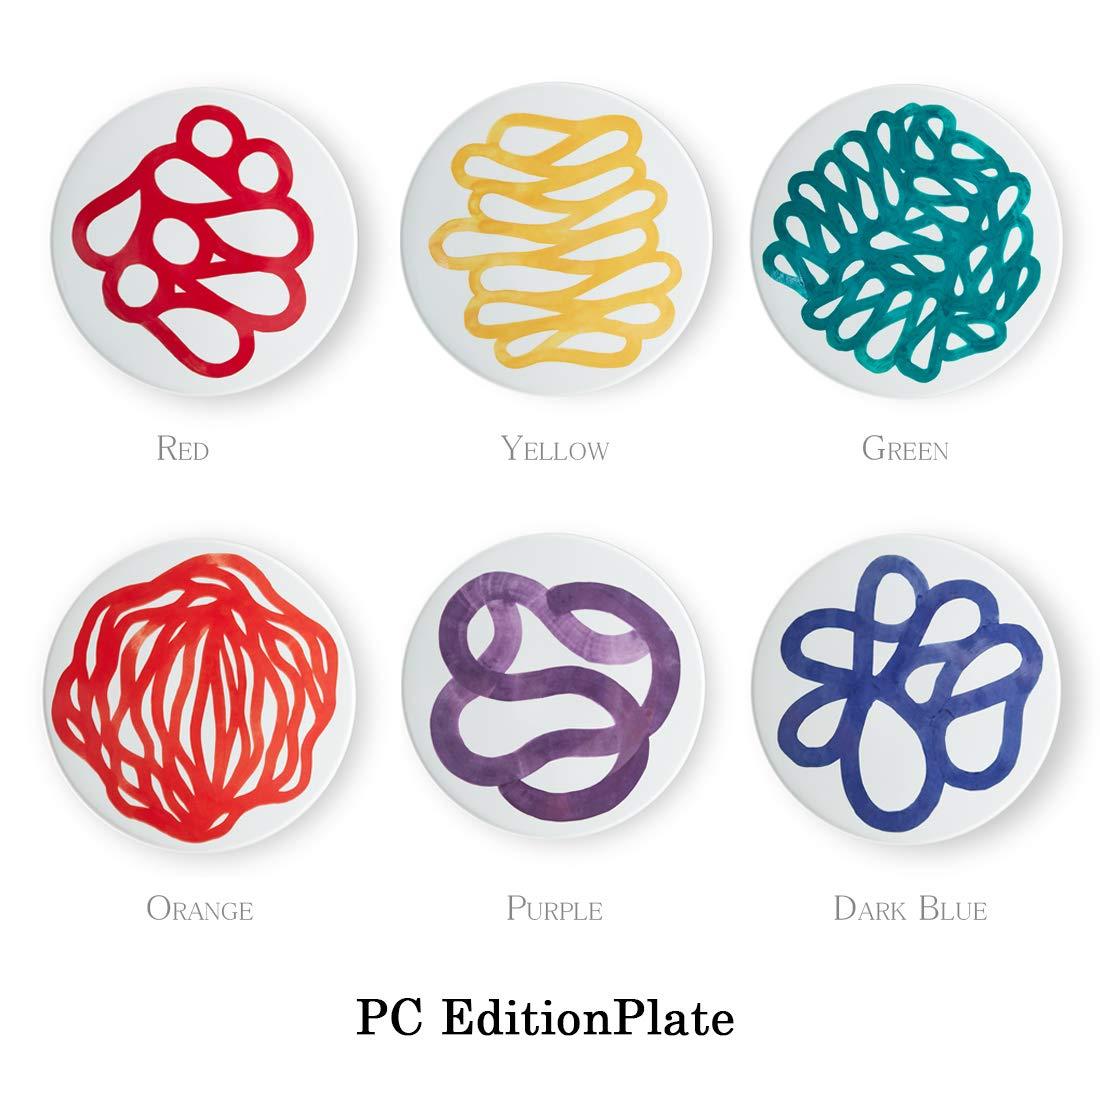 【PC Outline collection】1616/arita japan PC Edition Plate RED《PC エディションプレート レッド》Pierre Charpin ピエールシャルパン/有田焼/磁器/百田陶園 B07LGYZDDT